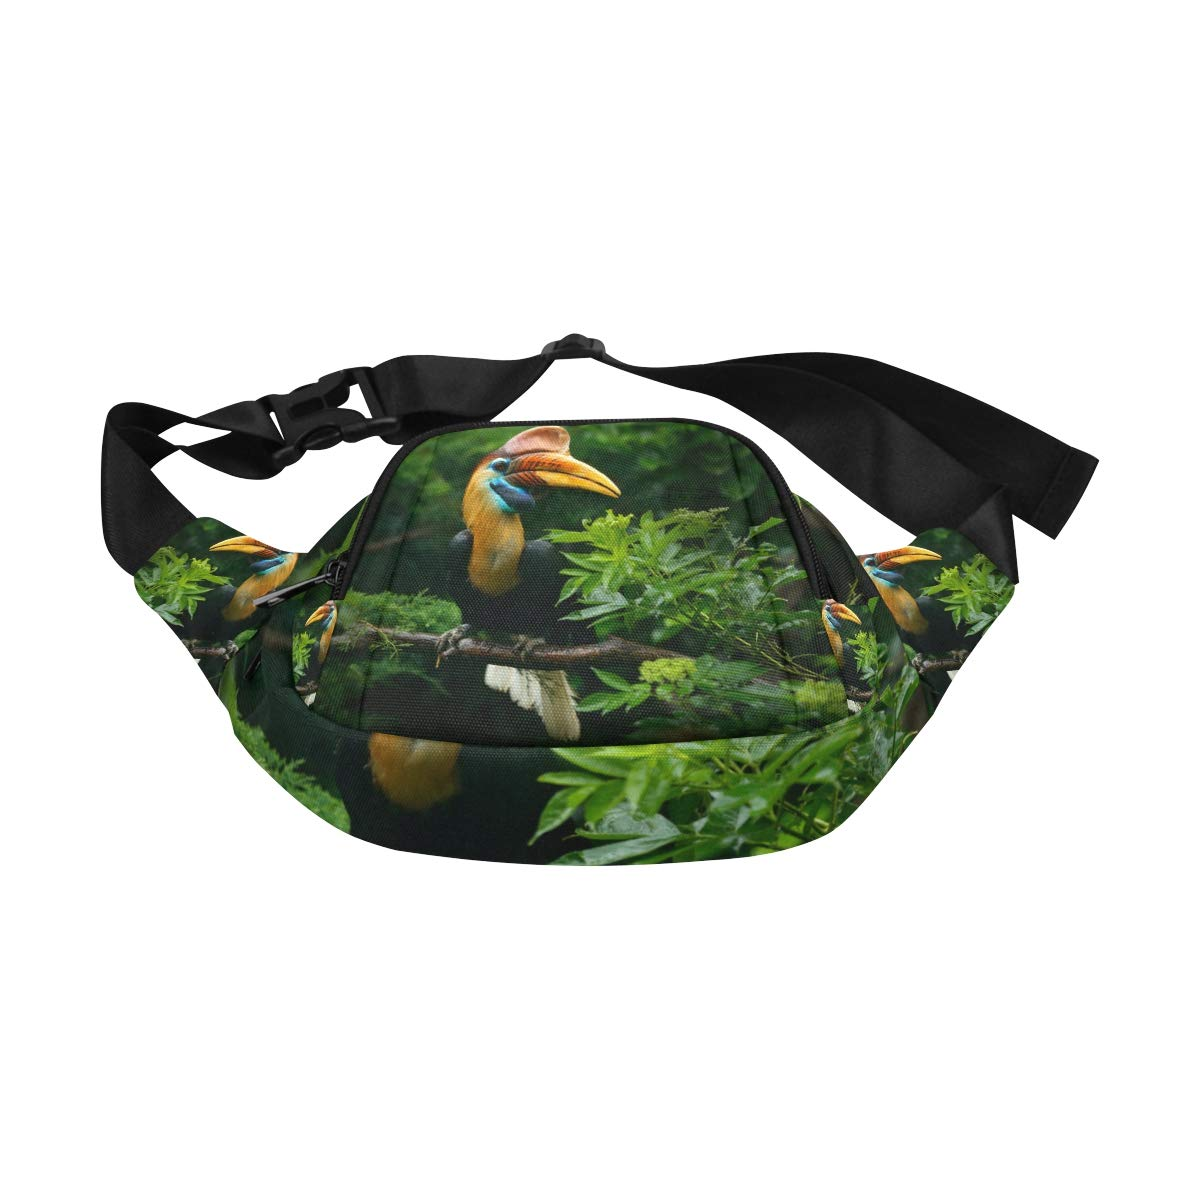 Close-up Portrait Of A Hornbill Bird Fenny Packs Waist Bags Adjustable Belt Waterproof Nylon Travel Running Sport Vacation Party For Men Women Boys Girls Kids